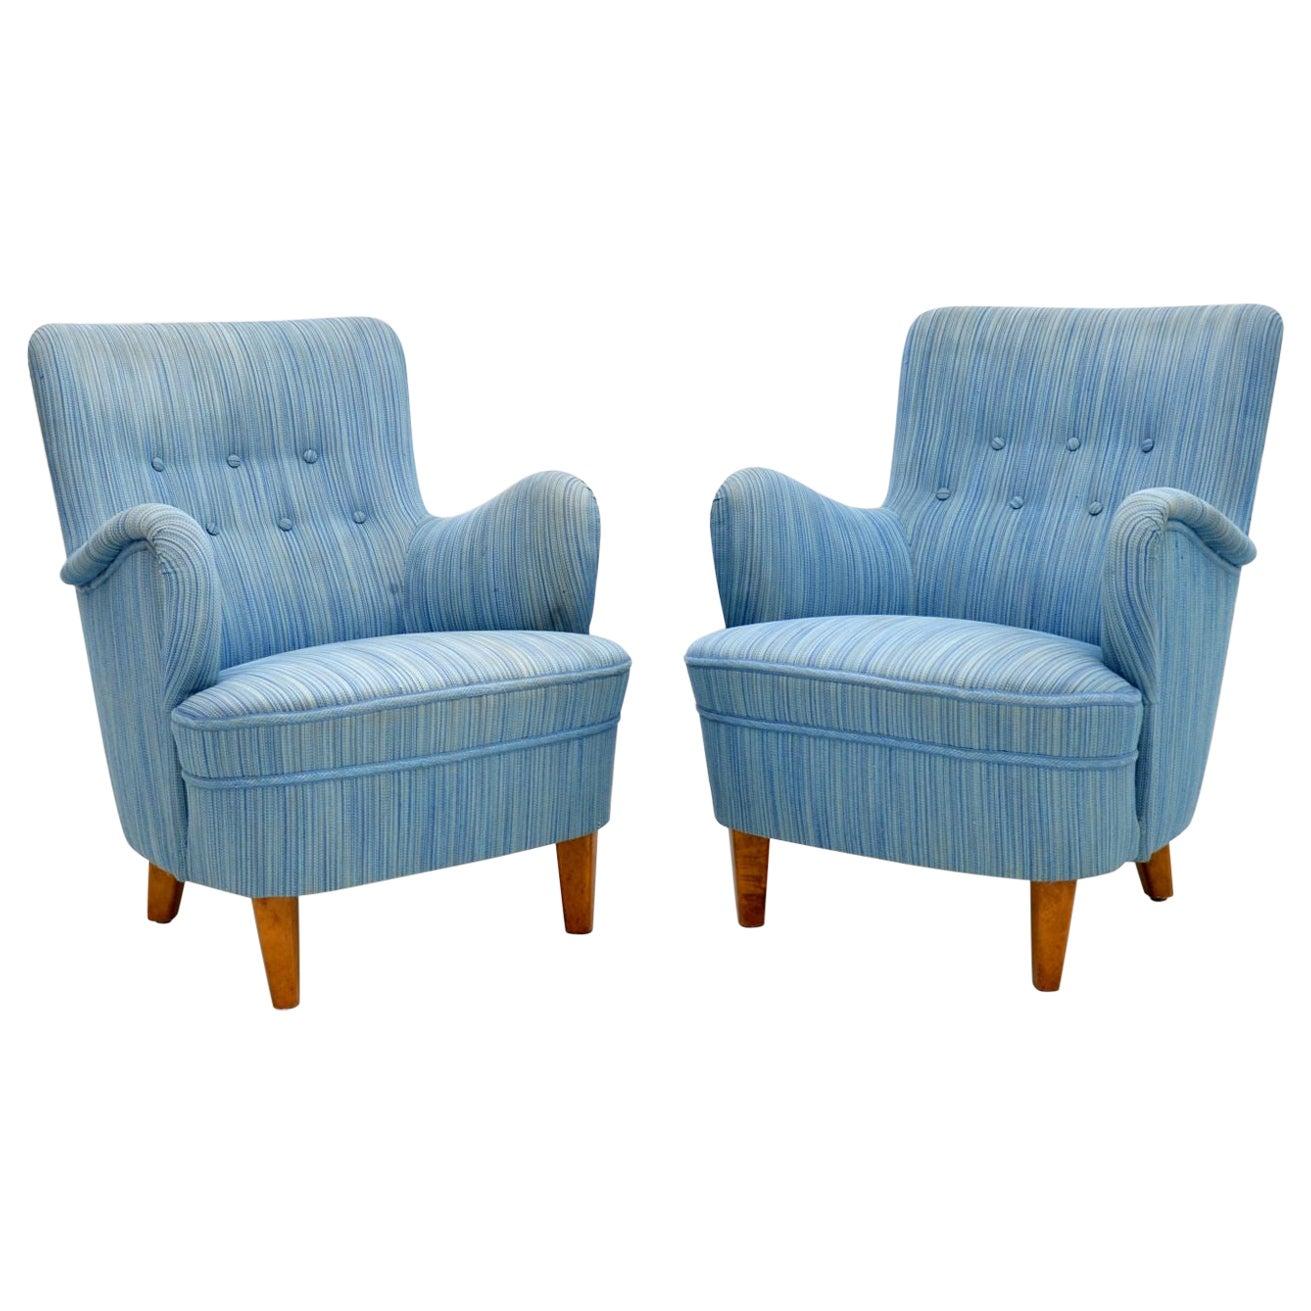 Pair of Swedish Vintage Armchairs by Carl Malmsten